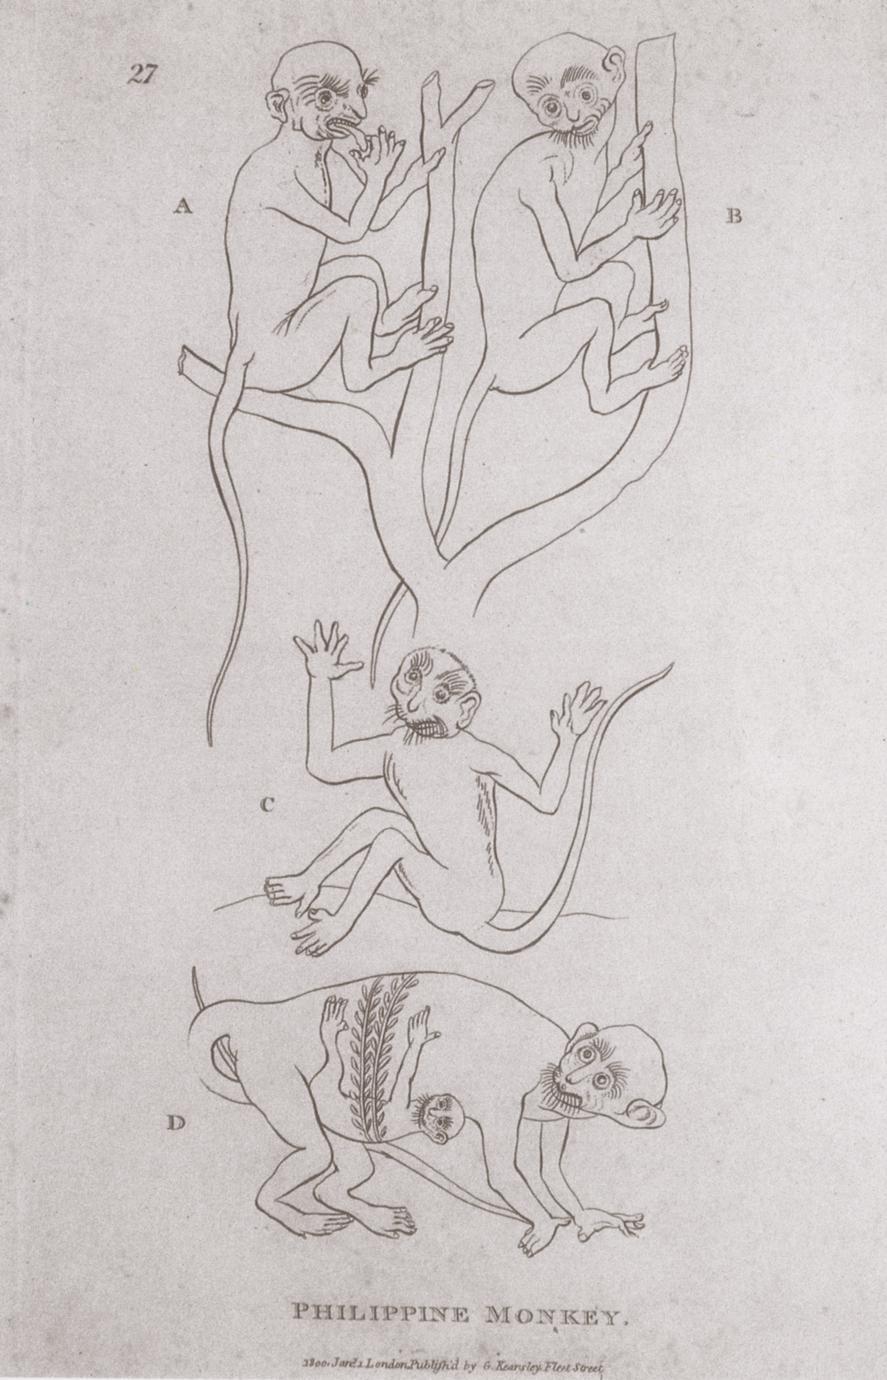 Abbildung 4 : Philippine Monkey-Cercopithecus luzonis (Shaw, 1800)